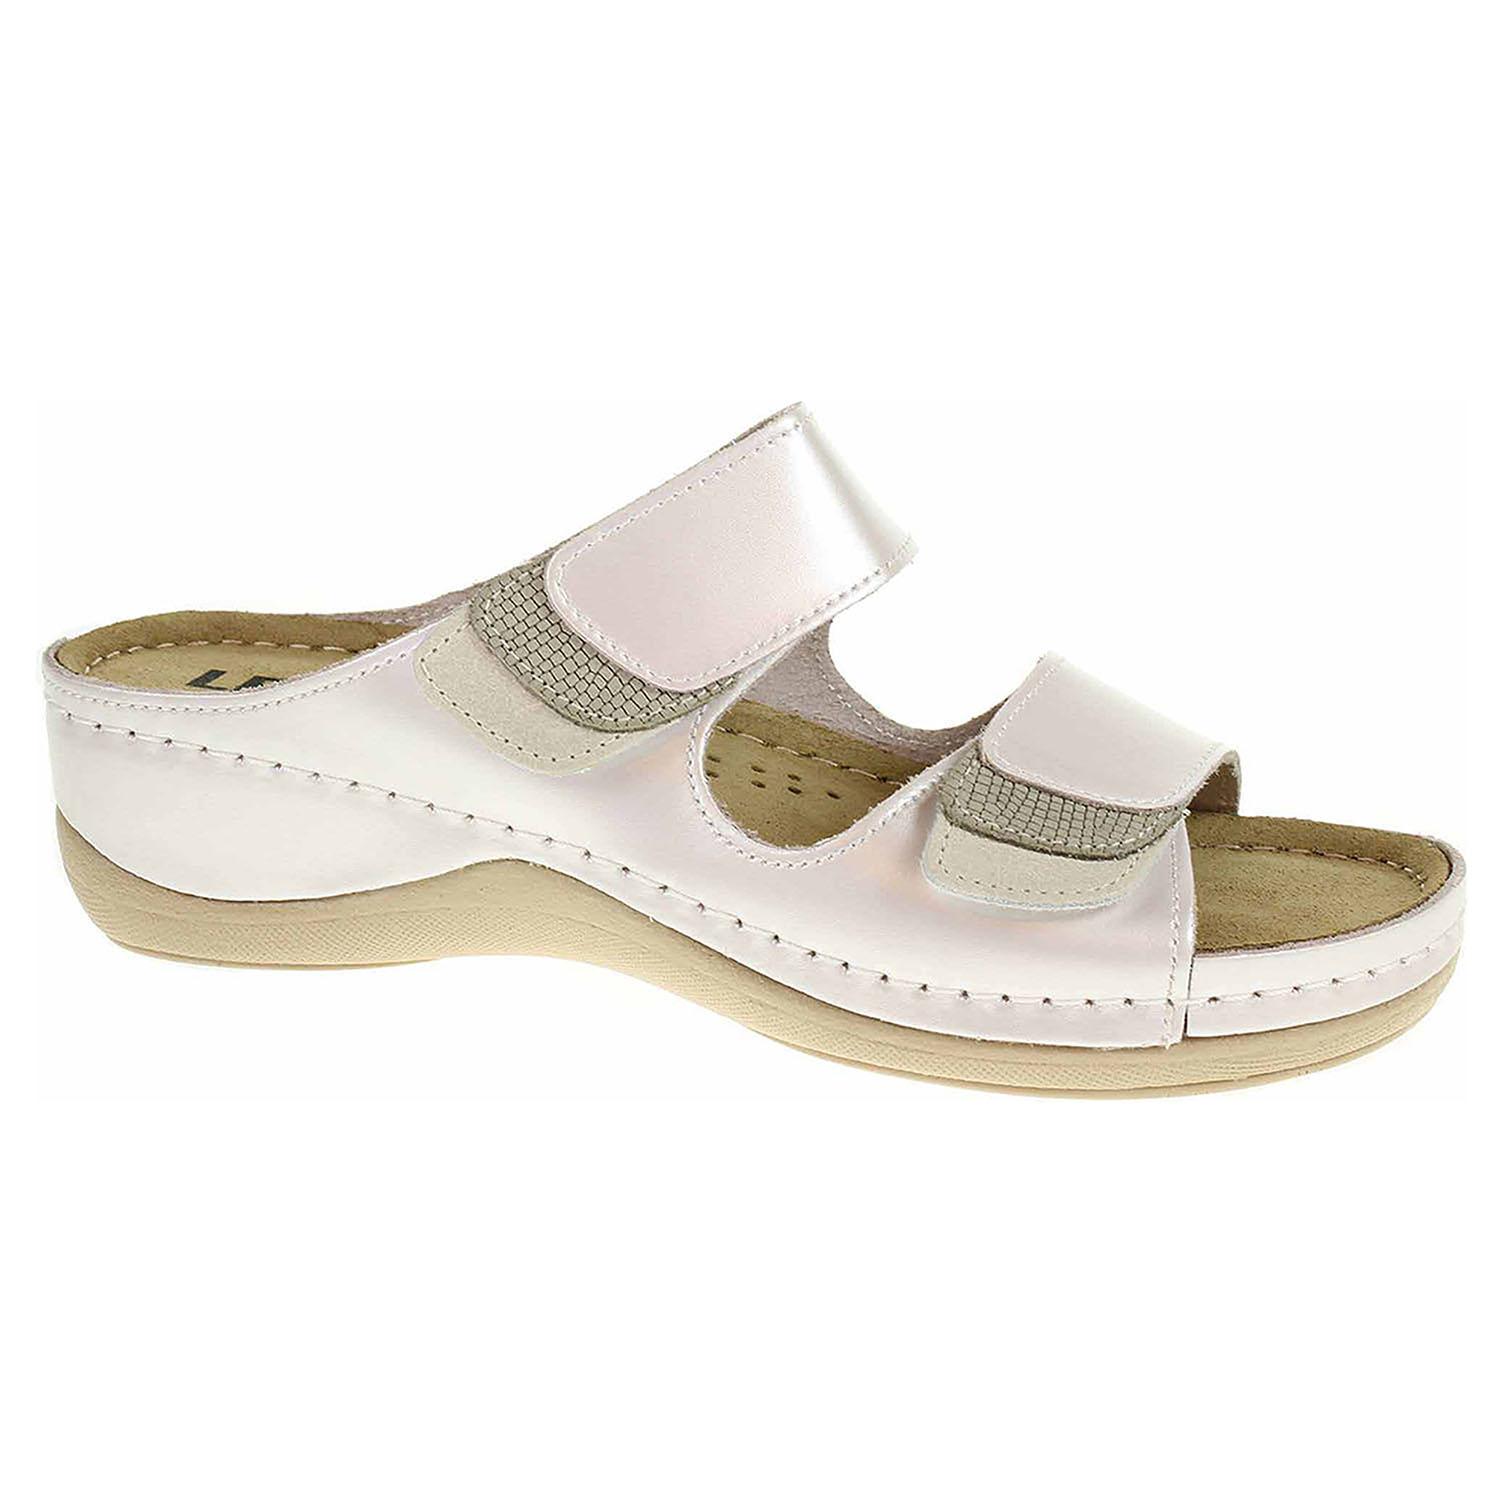 Dámské pantofle Leon 904 perla 904 perla 38